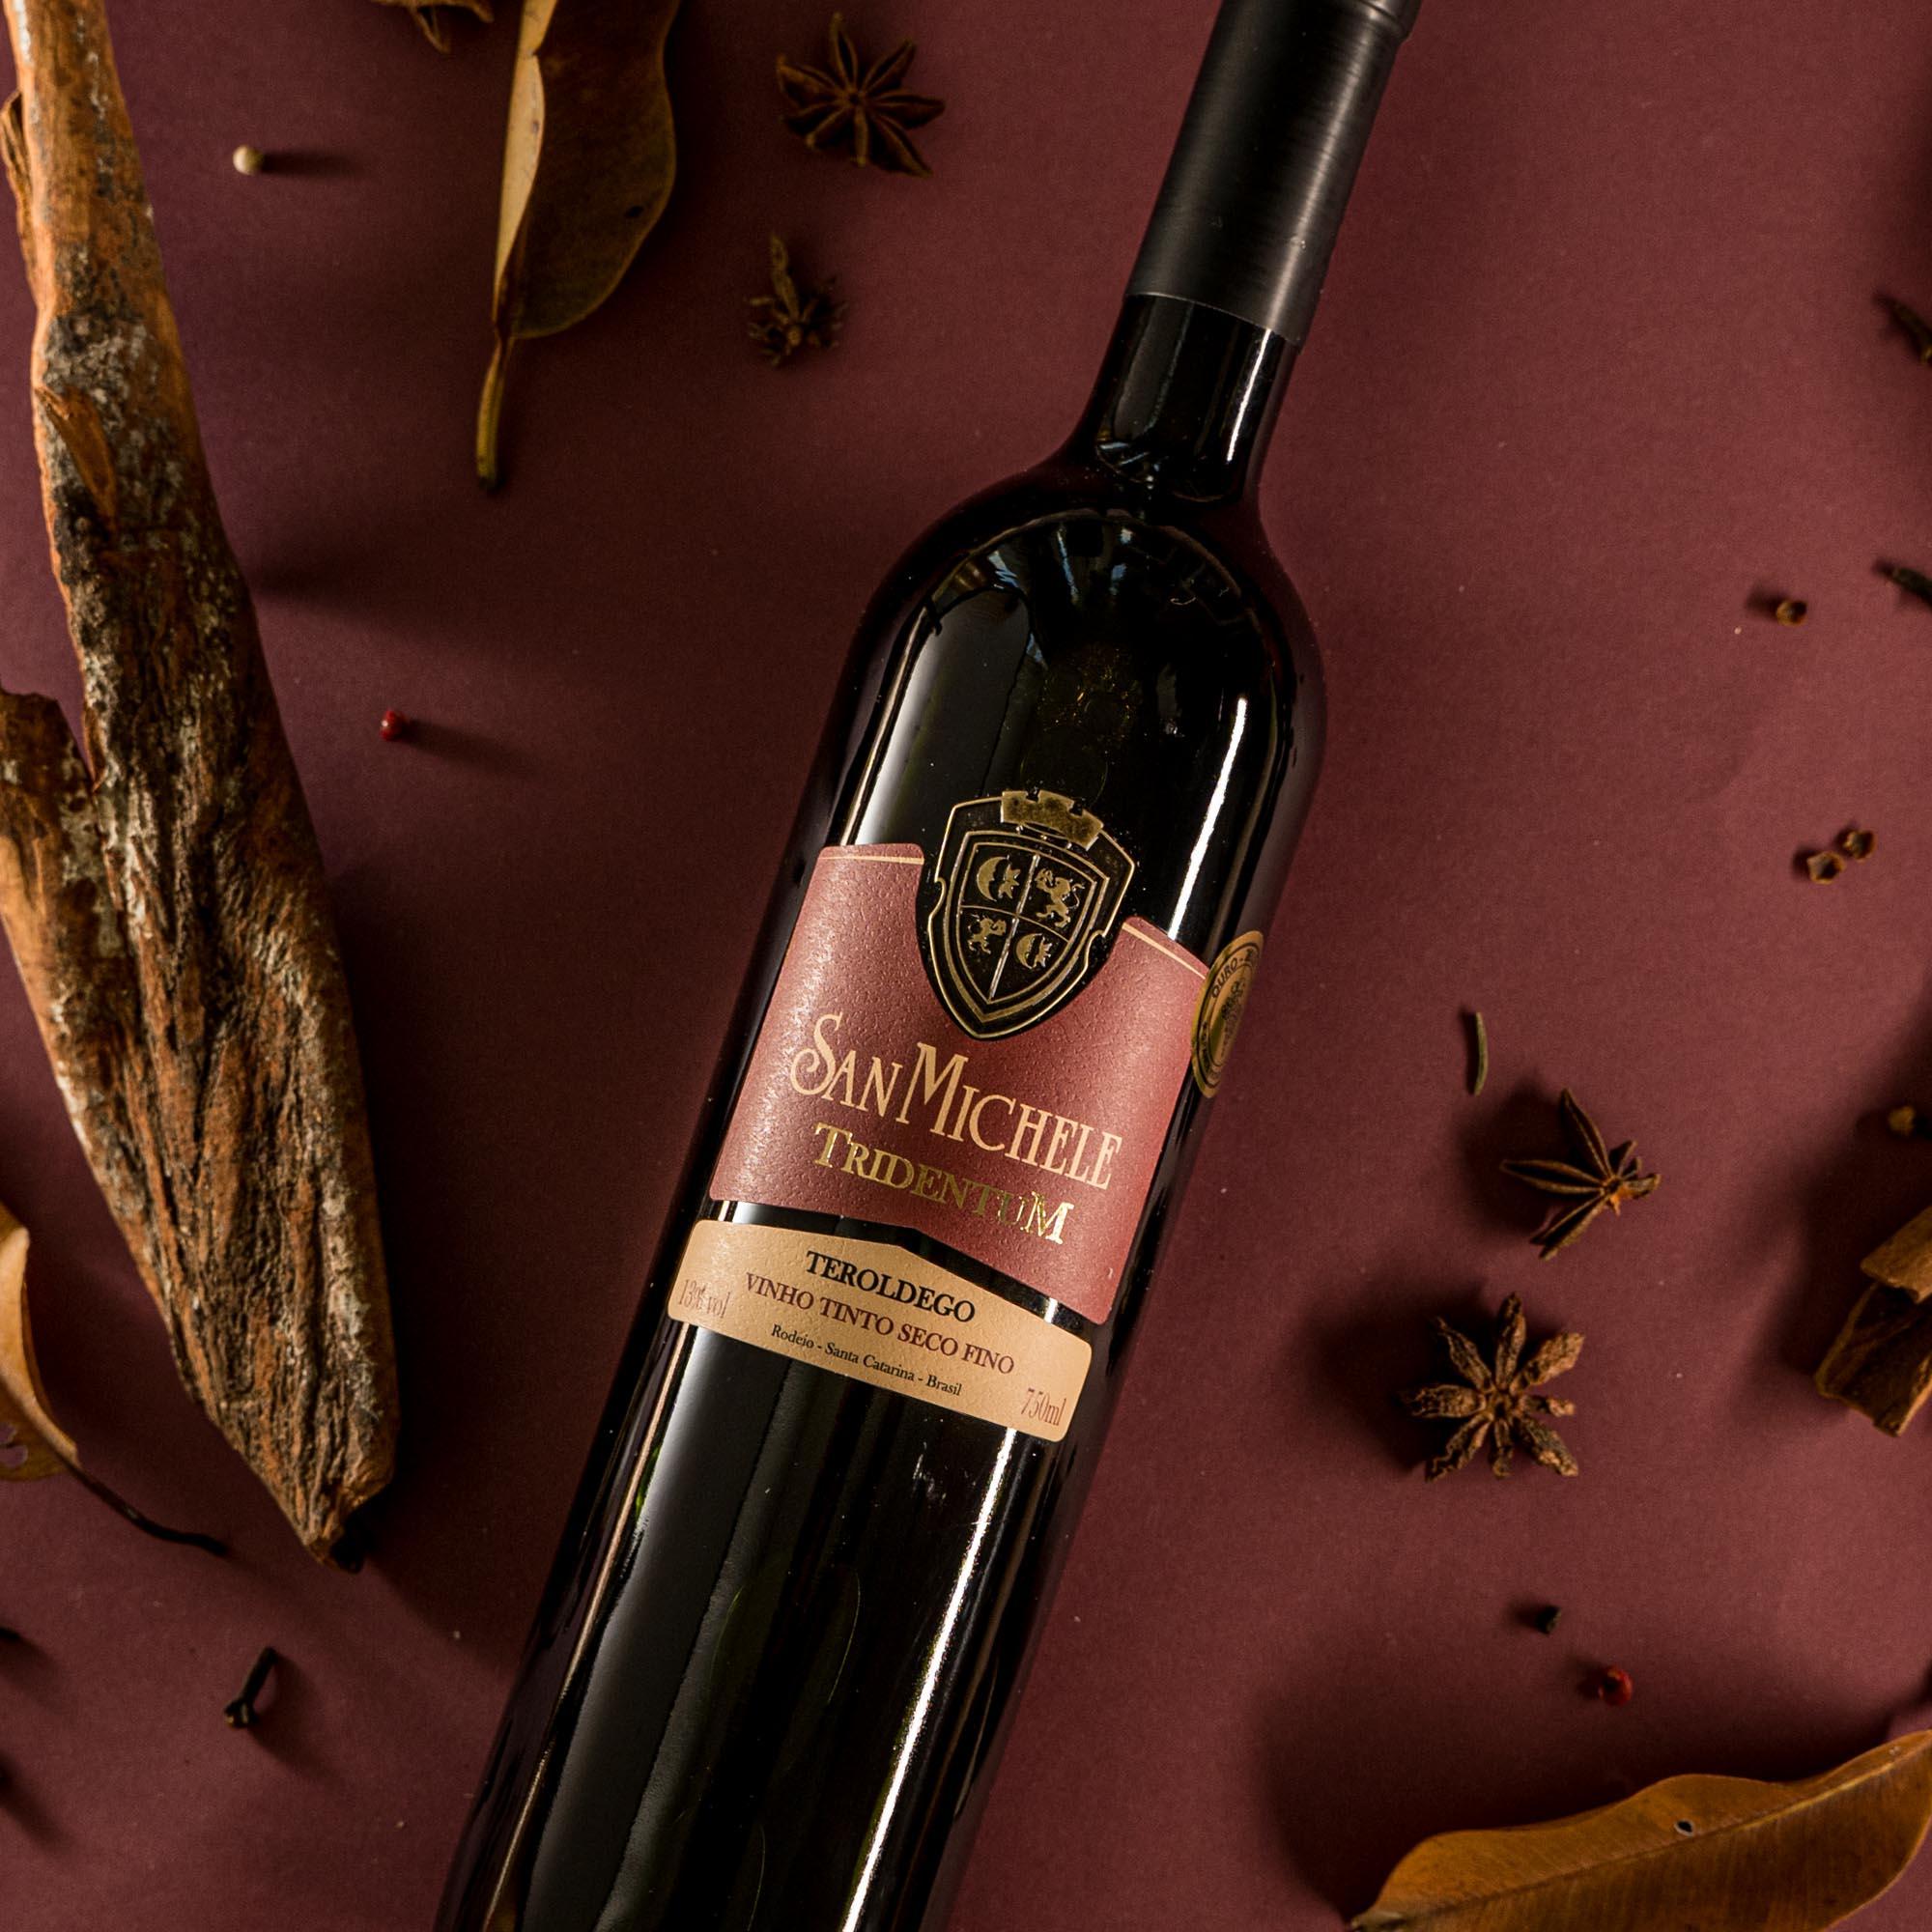 Vinho Tinto Tridentum - Teroldego 2019 - Vinícola San Michele